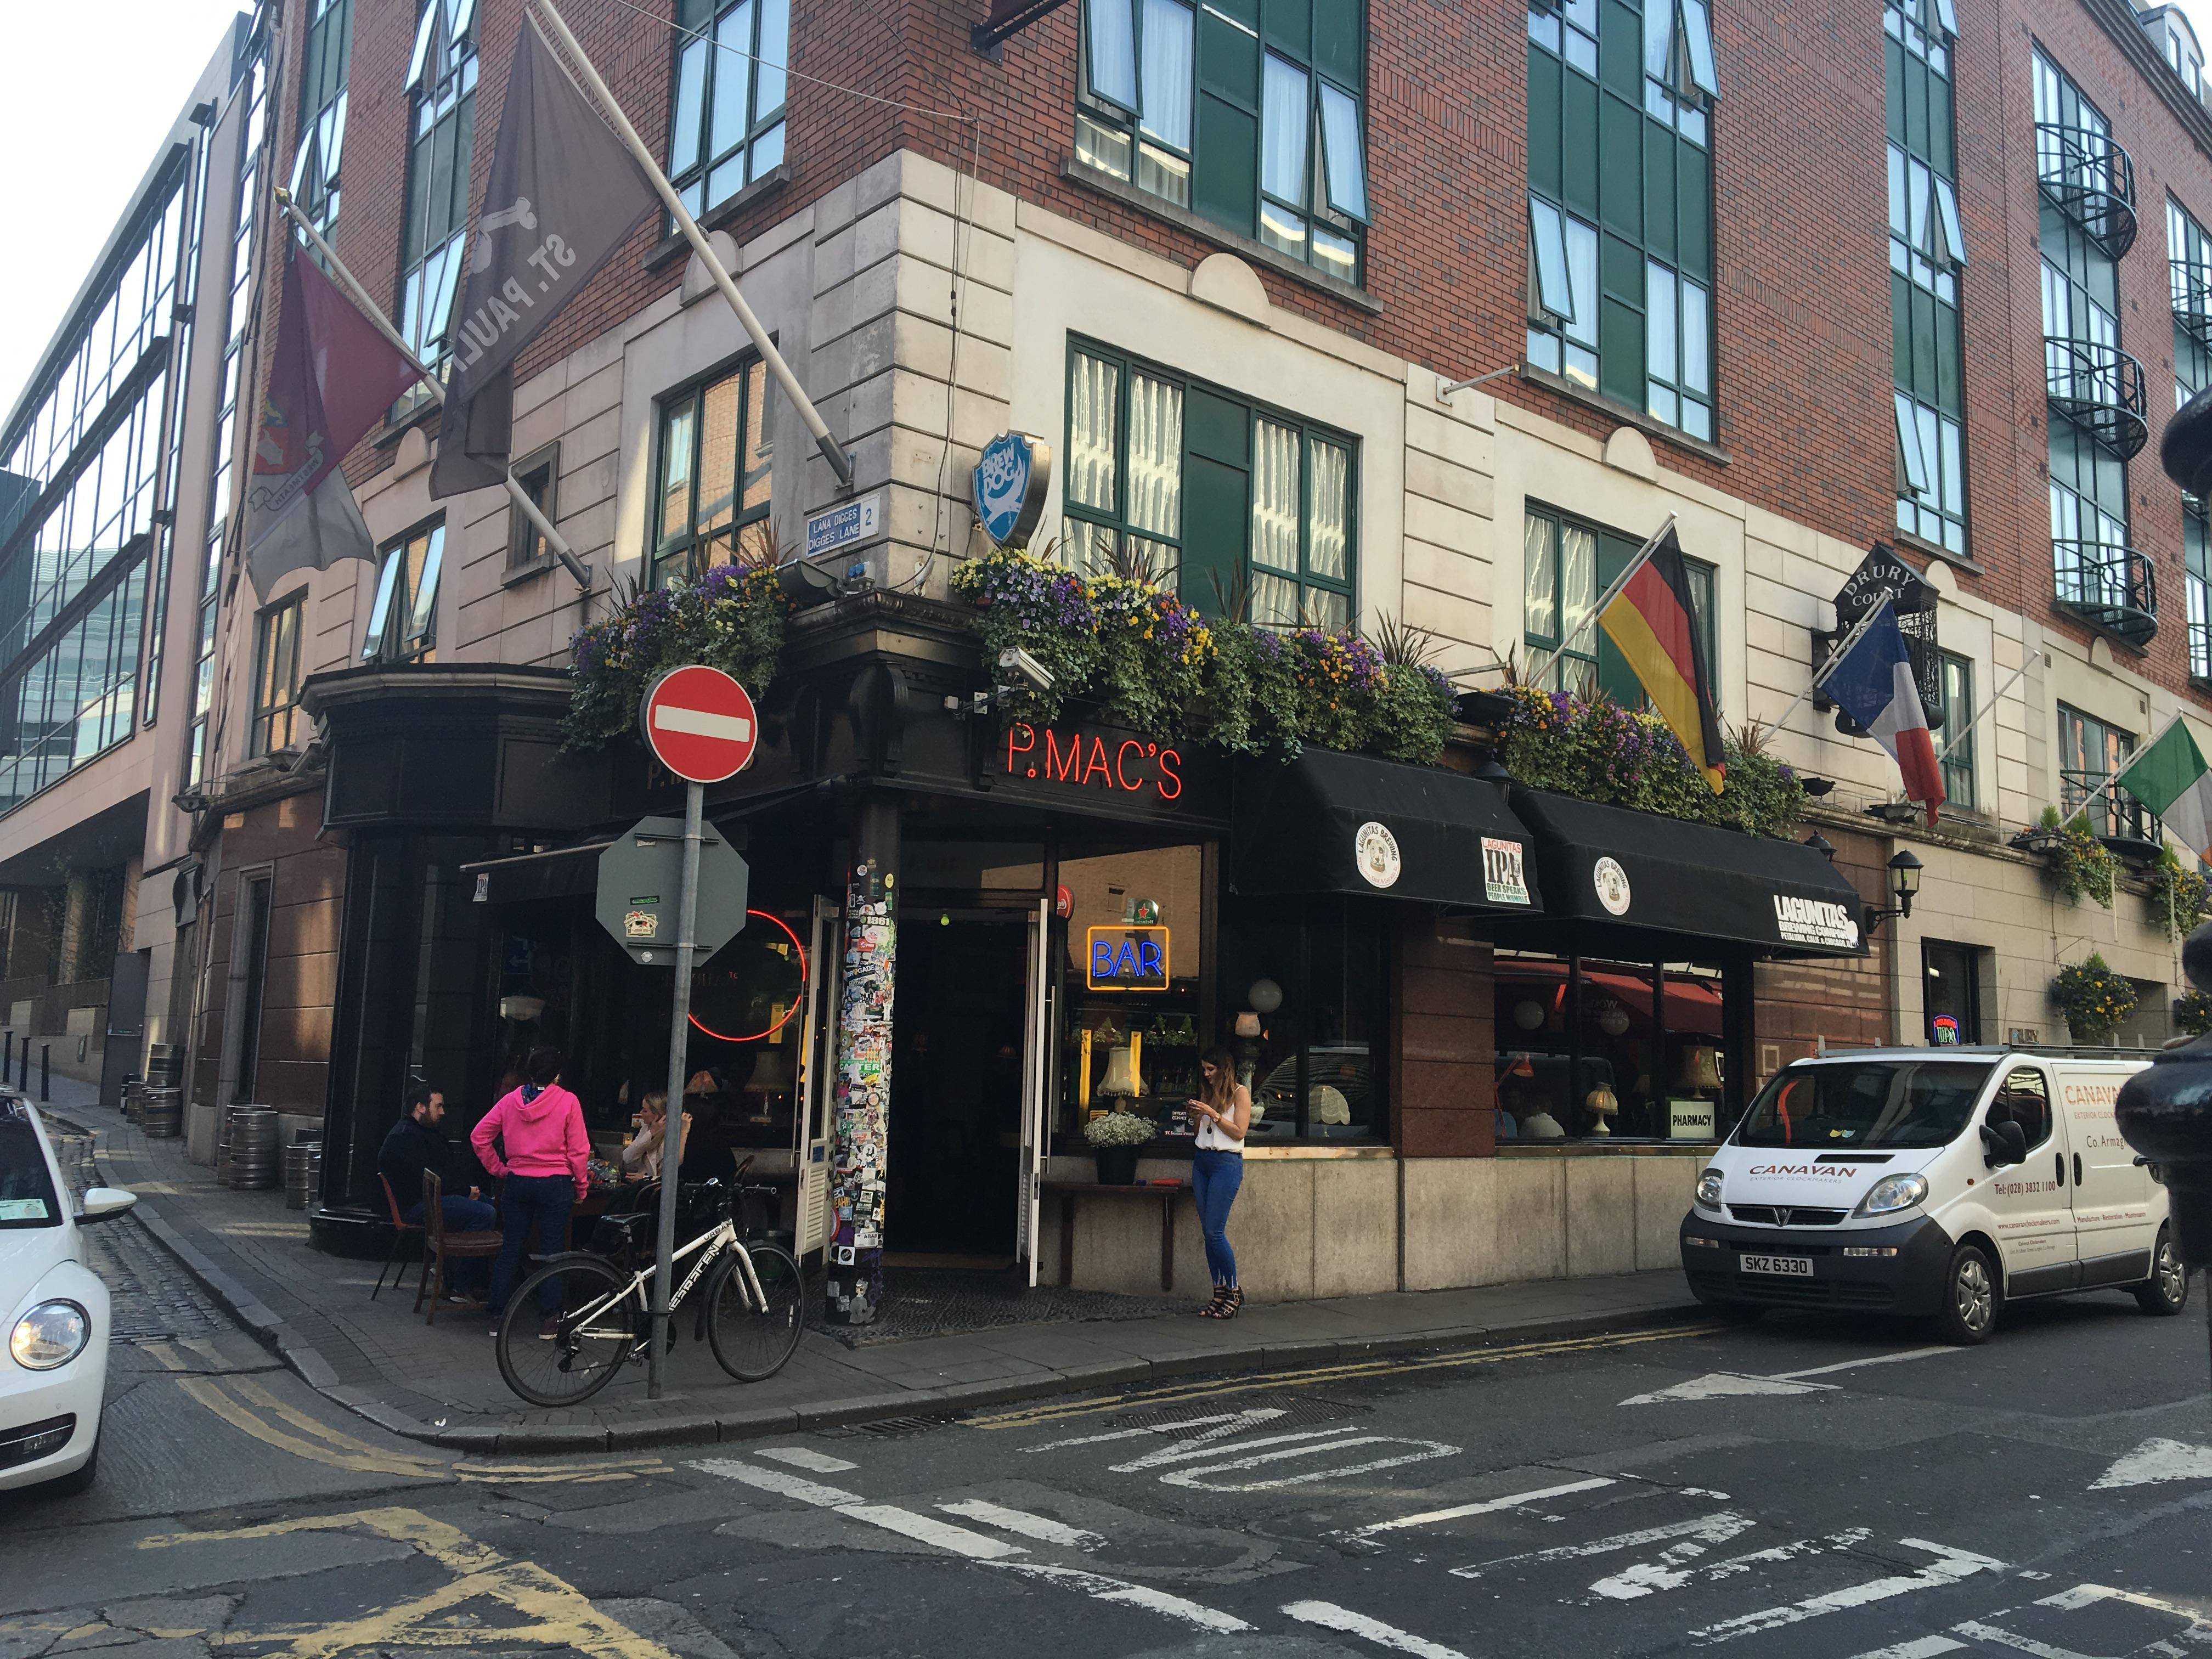 craft beer pub in Dublin